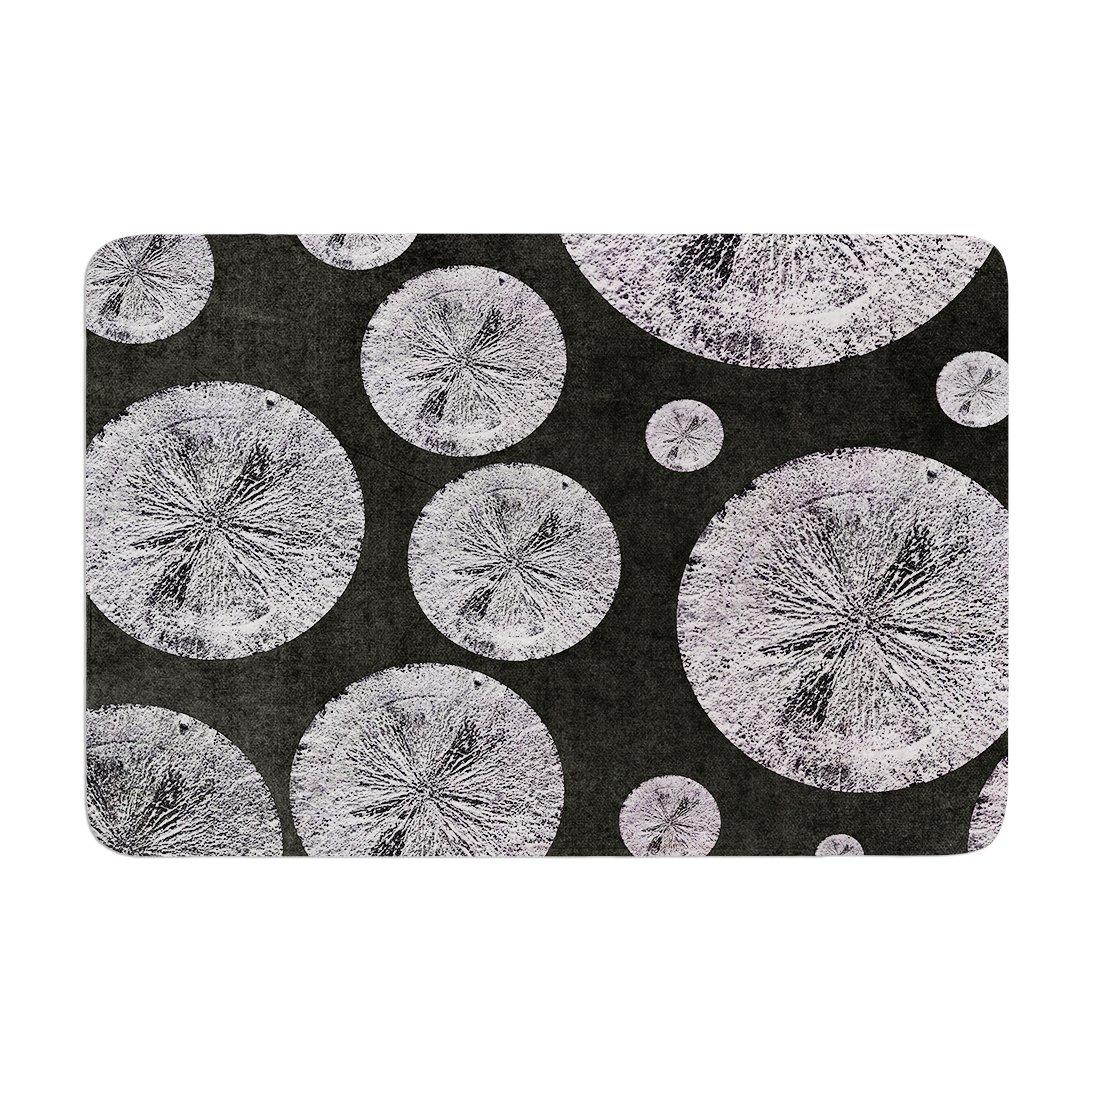 17 by 24 Kess InHouse Iris Lehnhardt Pyrite Black Grey Memory Foam Bath Mat